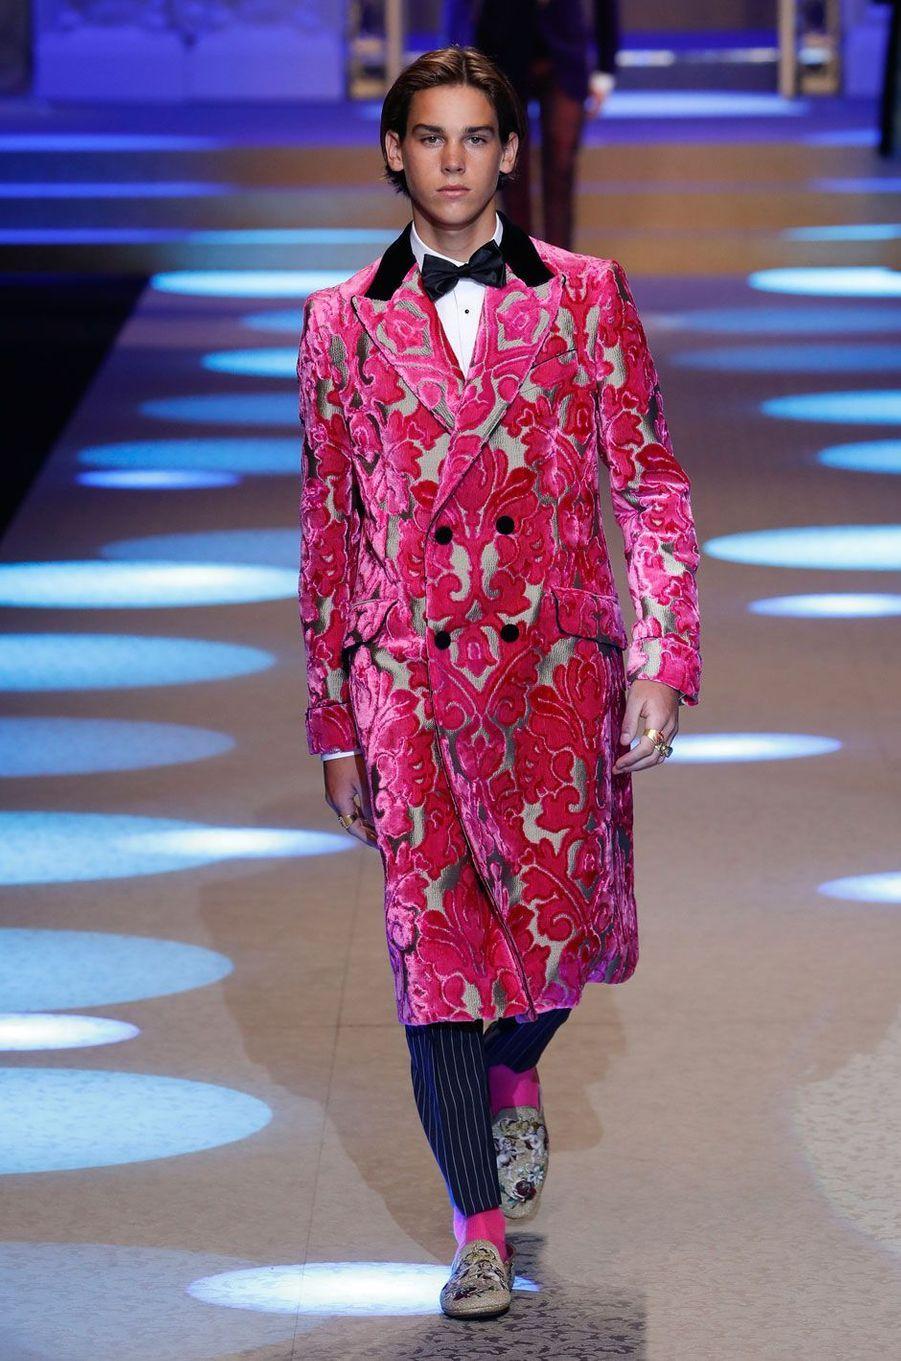 Défilé Dolce & Gabbana à Milan